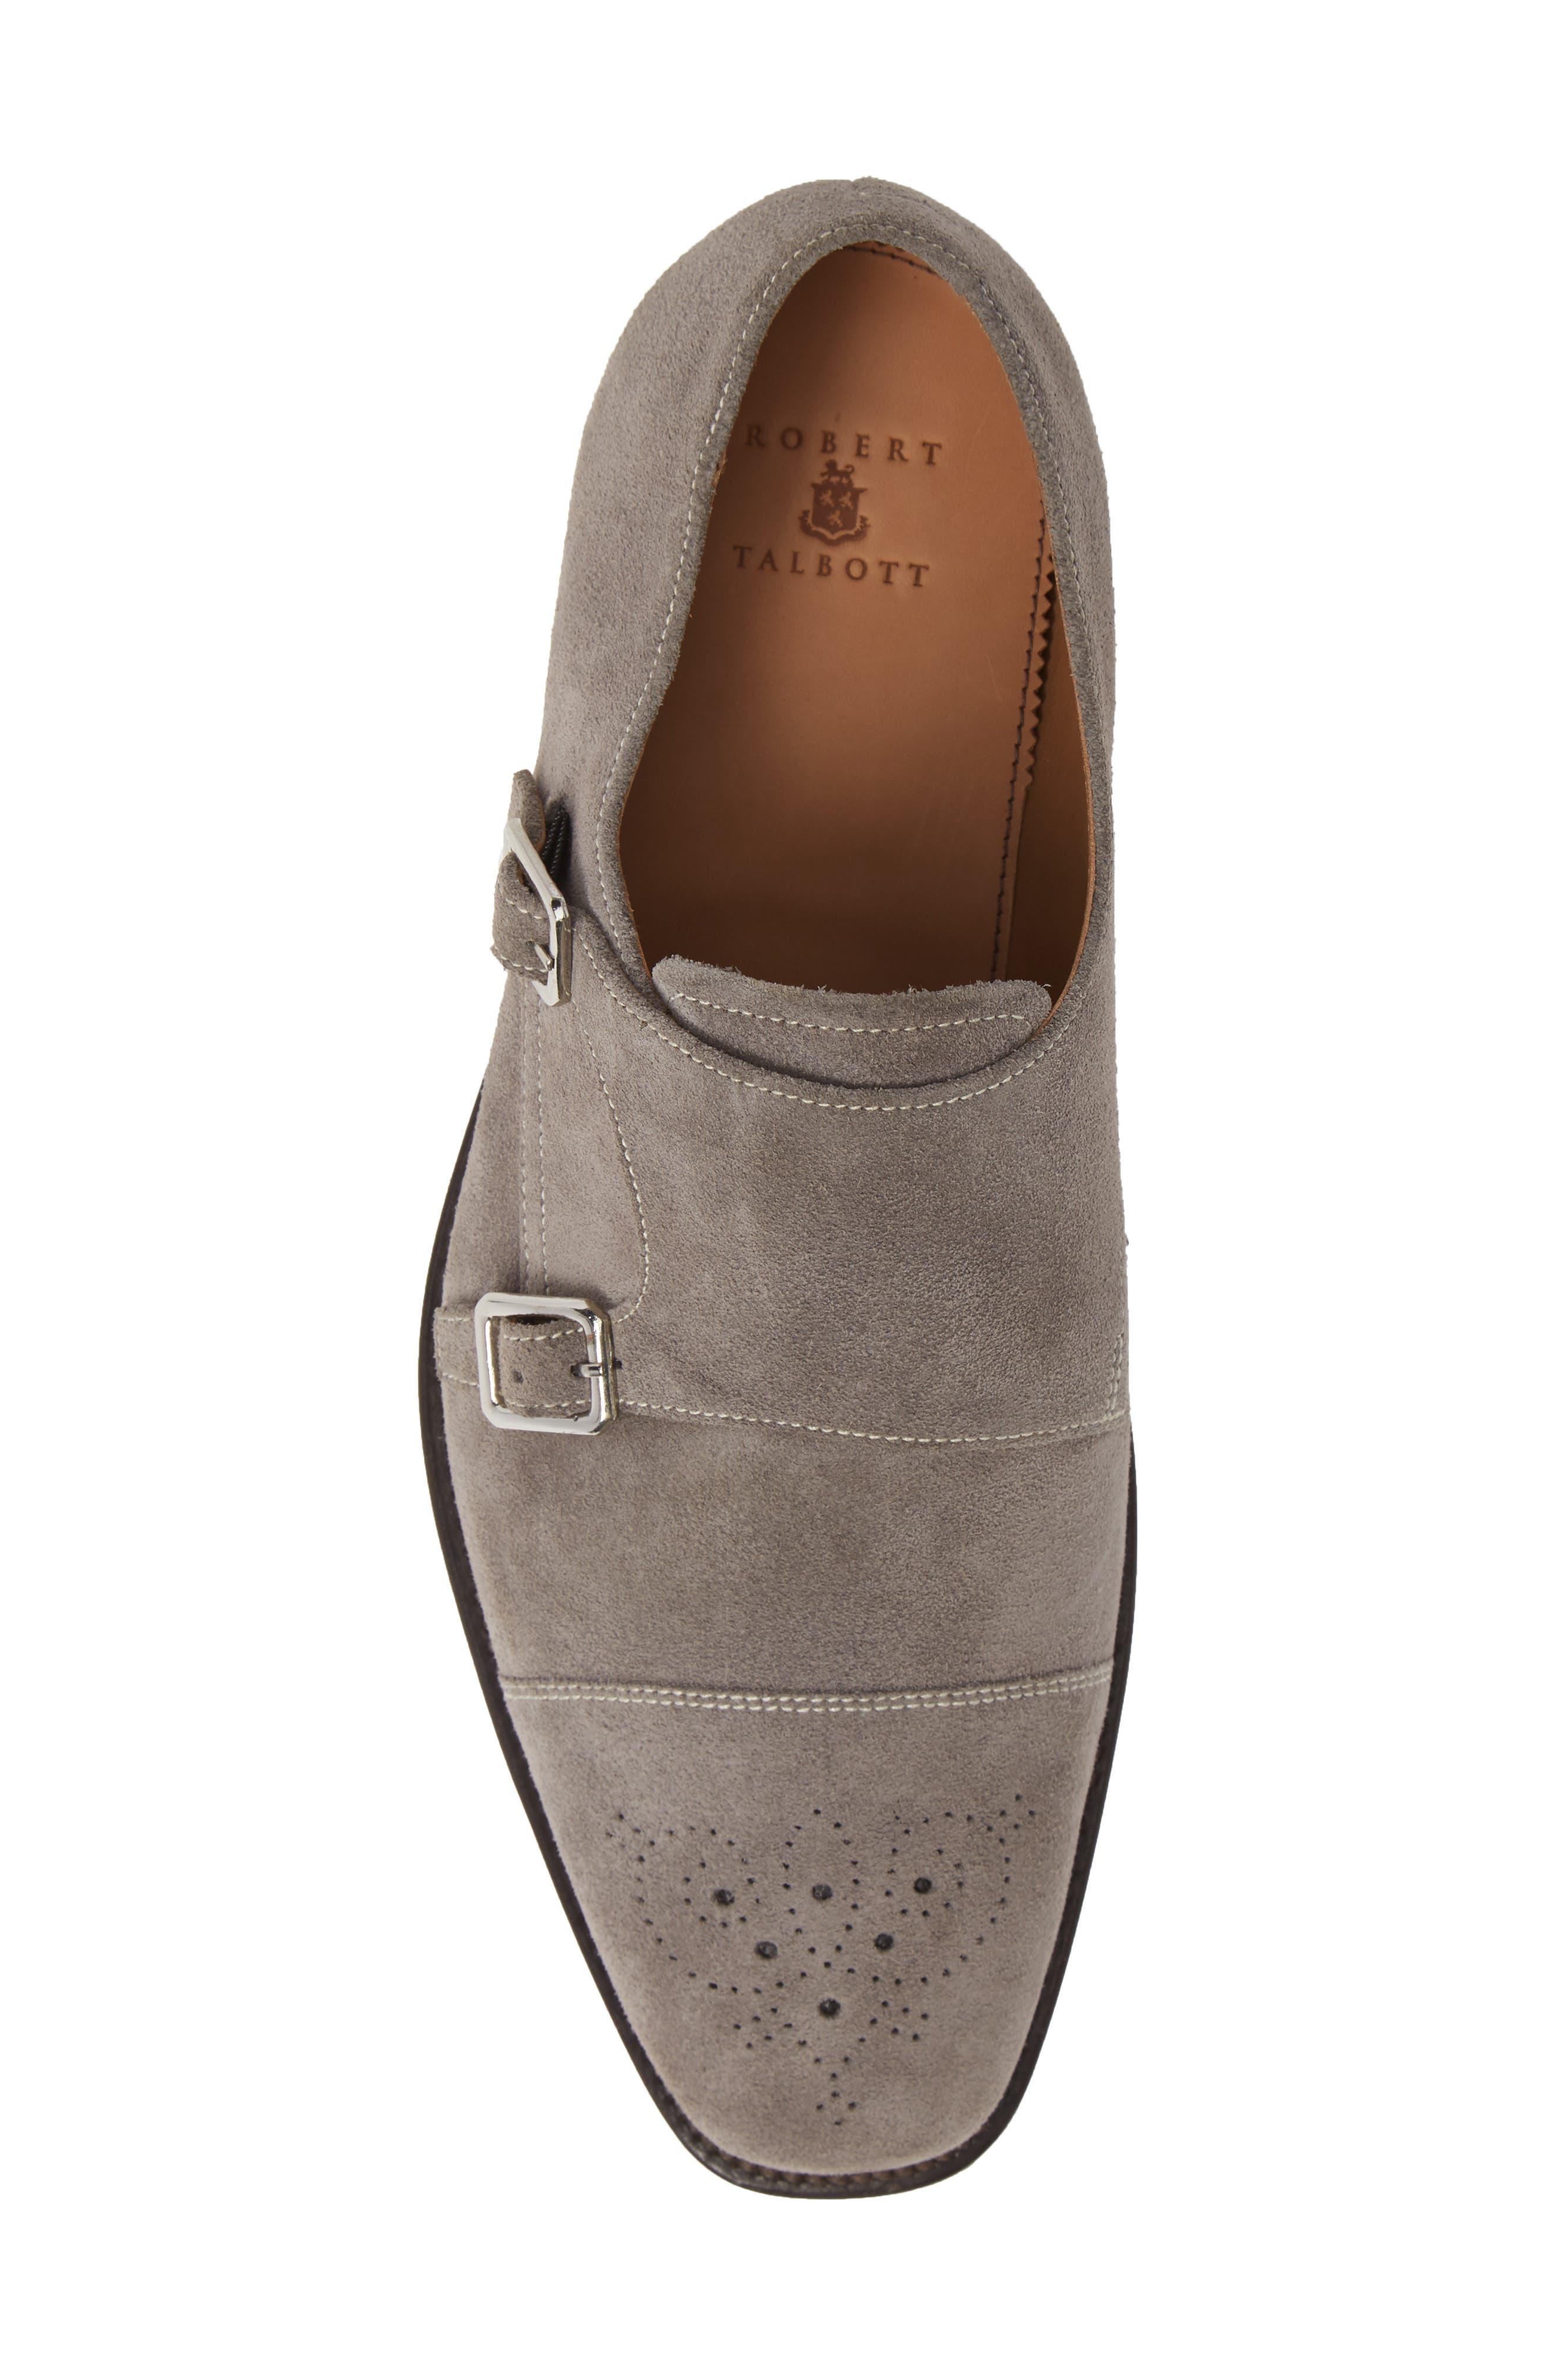 Sausalito Double Monk Strap Shoe,                             Alternate thumbnail 5, color,                             GREY SUEDE